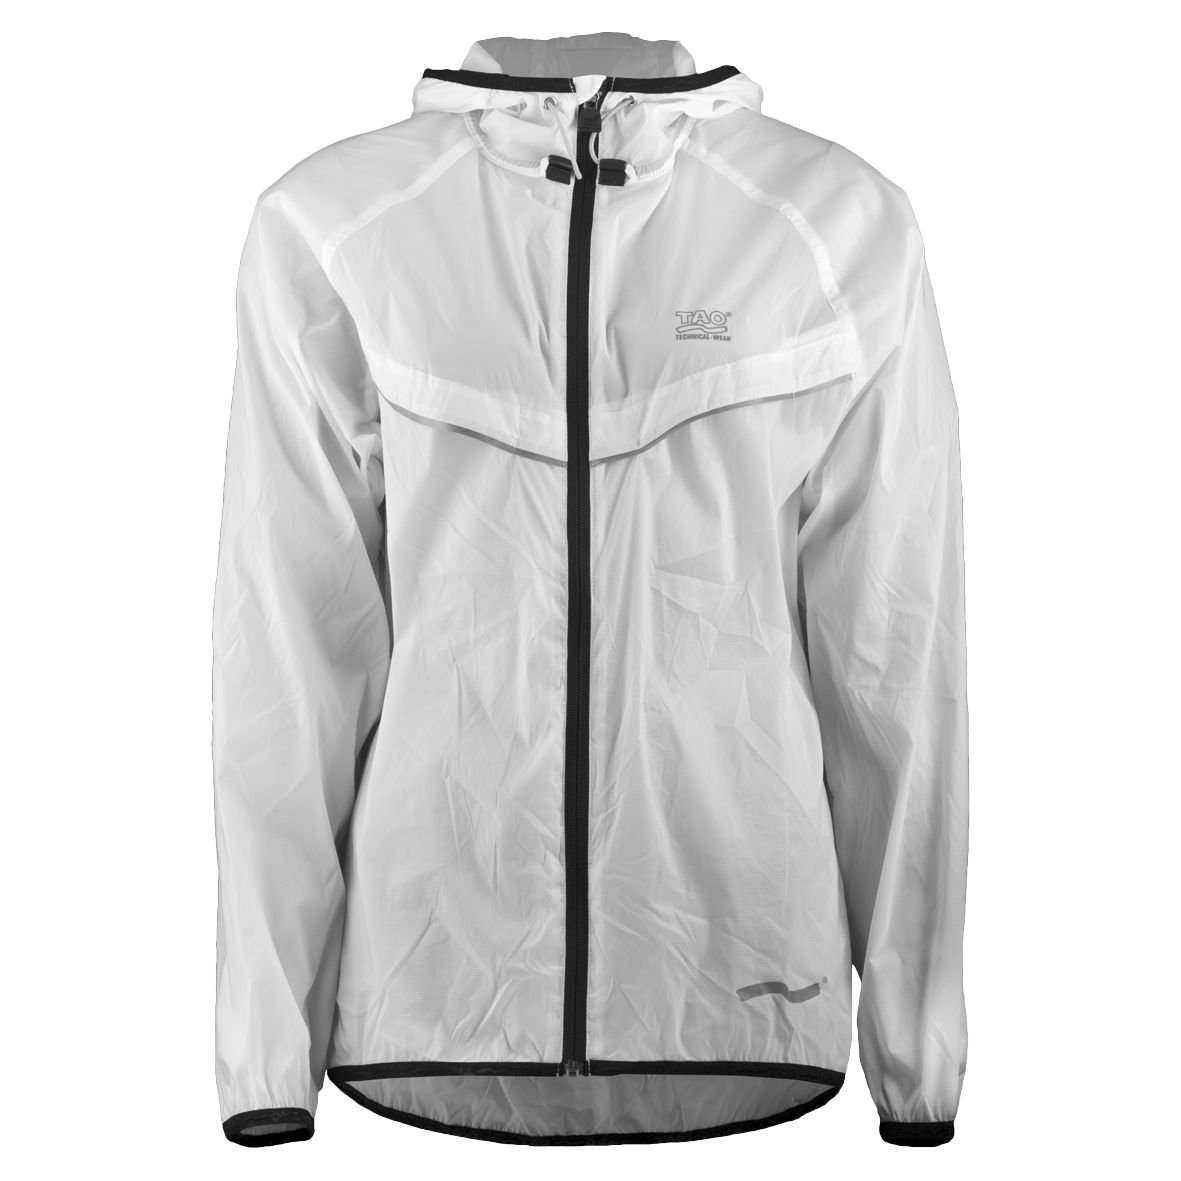 TAO Technical Wear SPORTING_GOODS レディース カラー: ホワイト   B00CJBM6SW